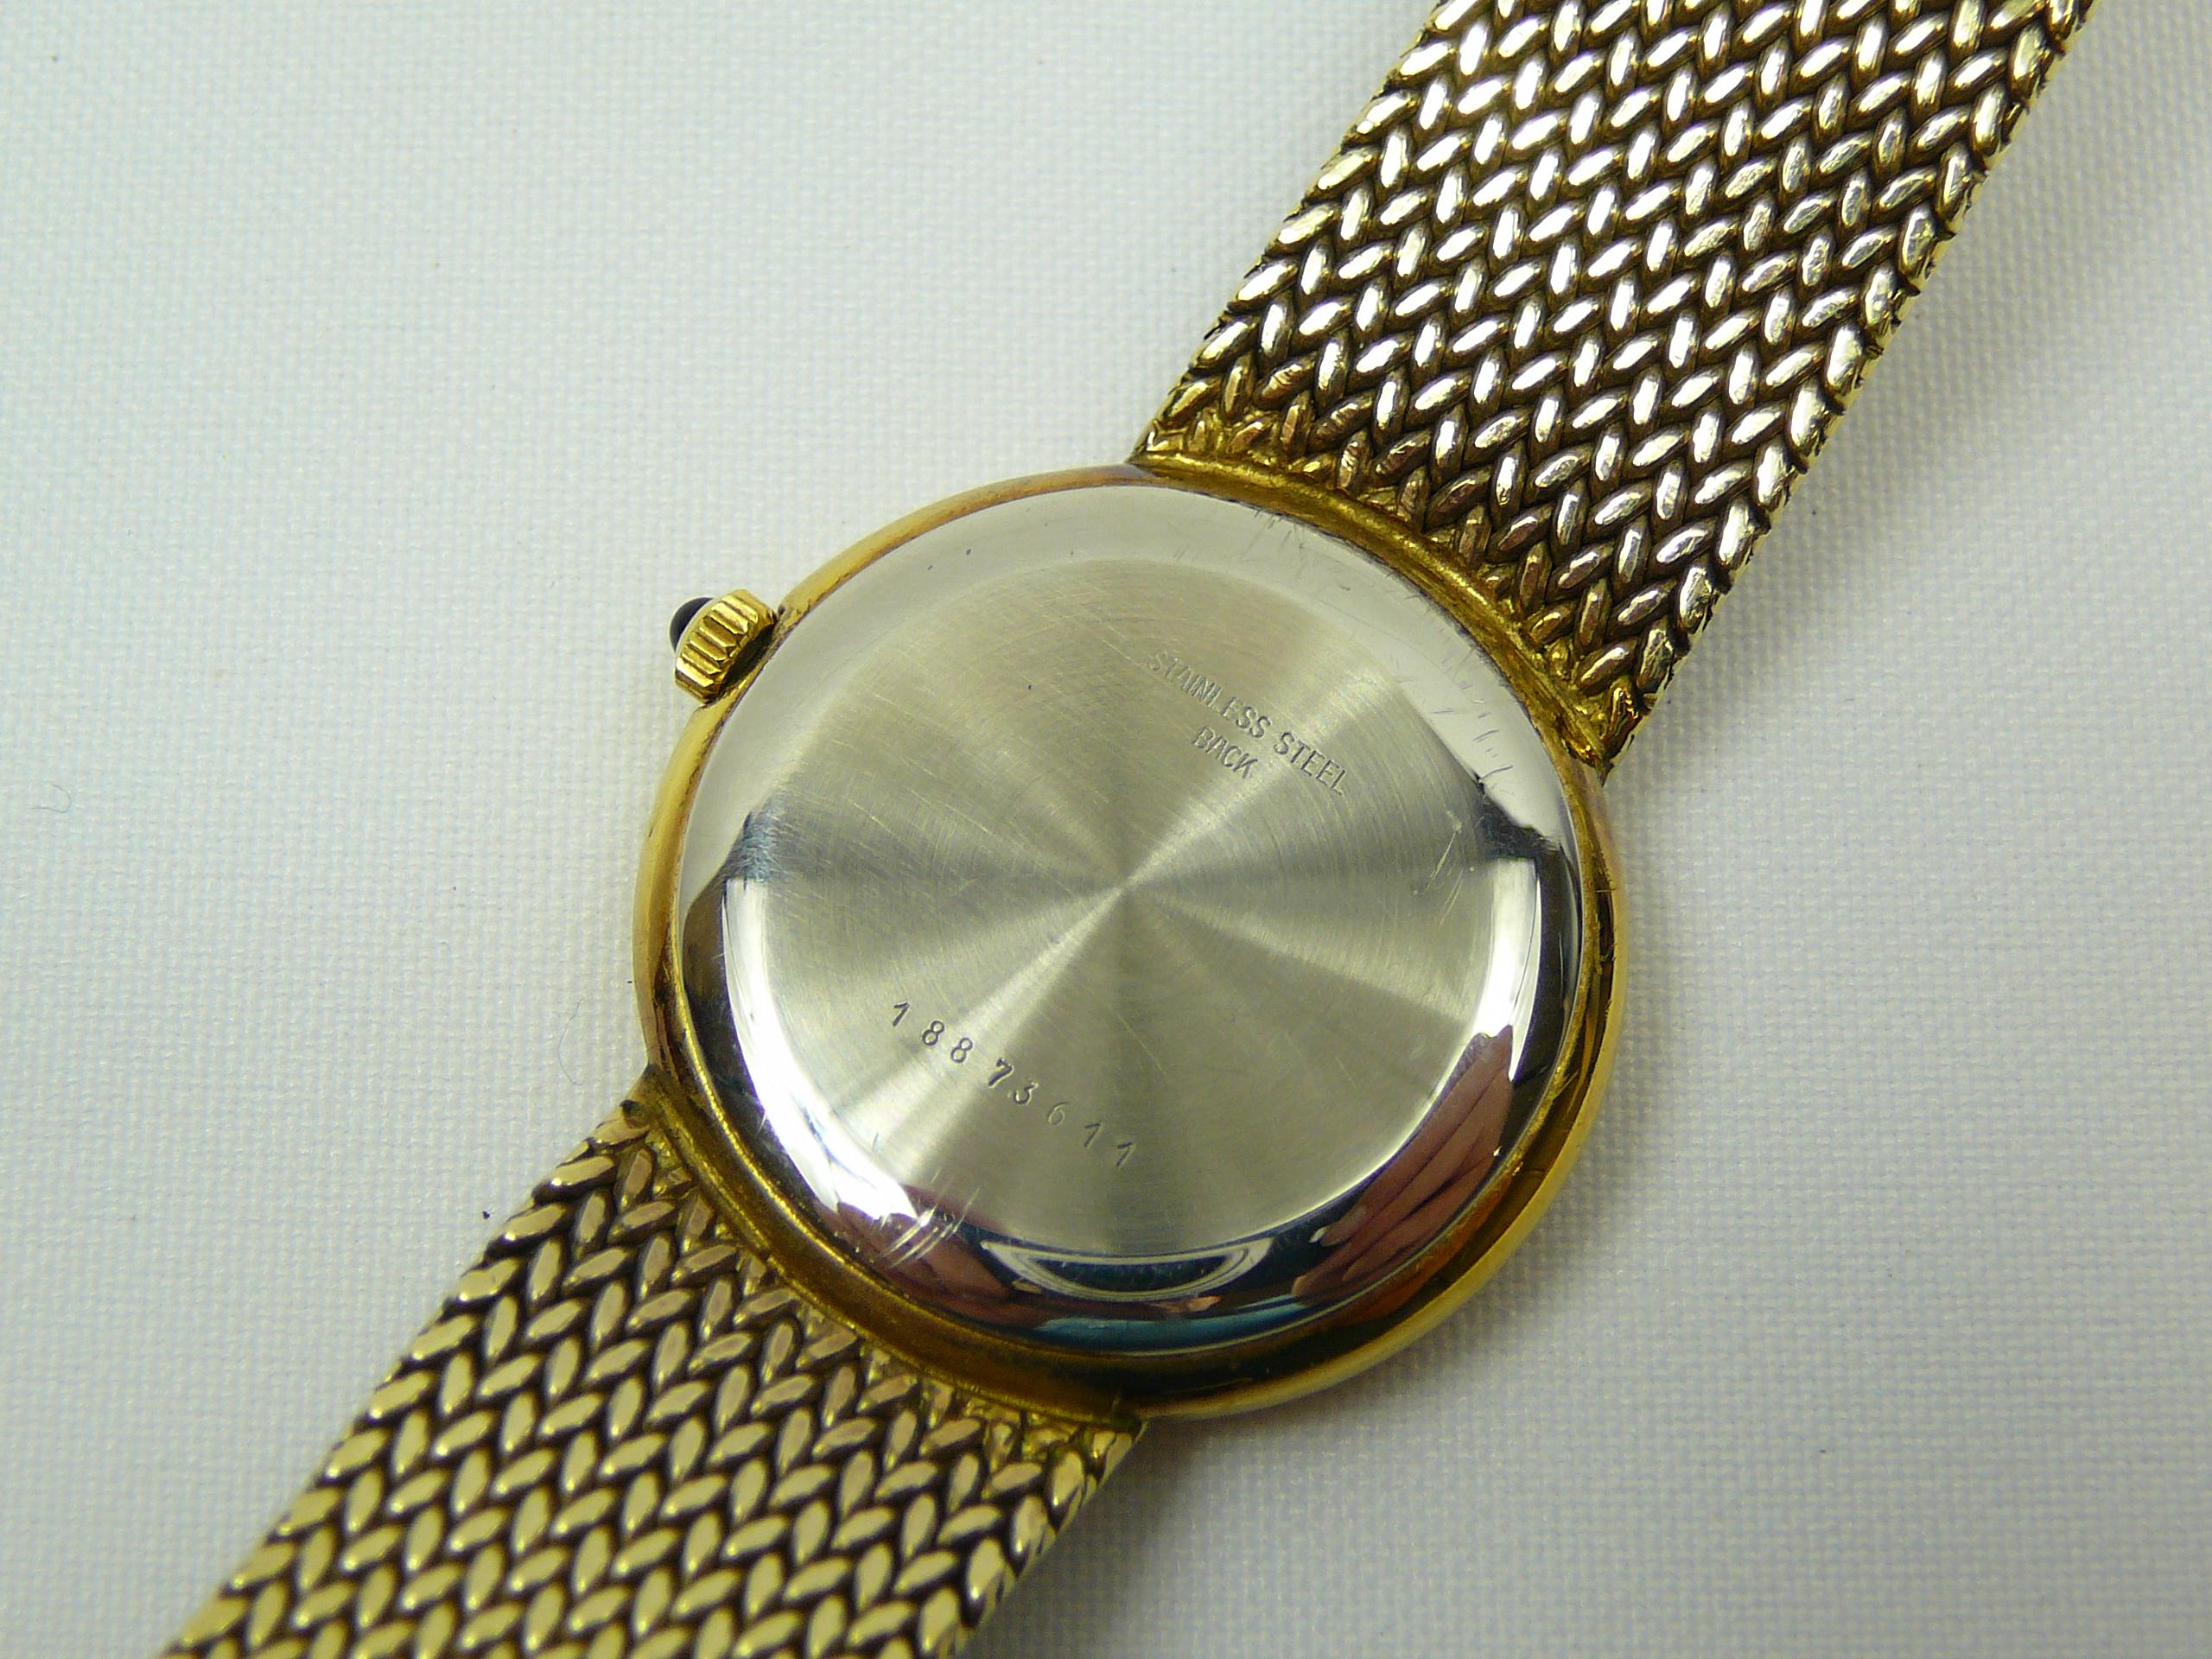 Lot 23 - Gents Longines Silver Wrist Watch